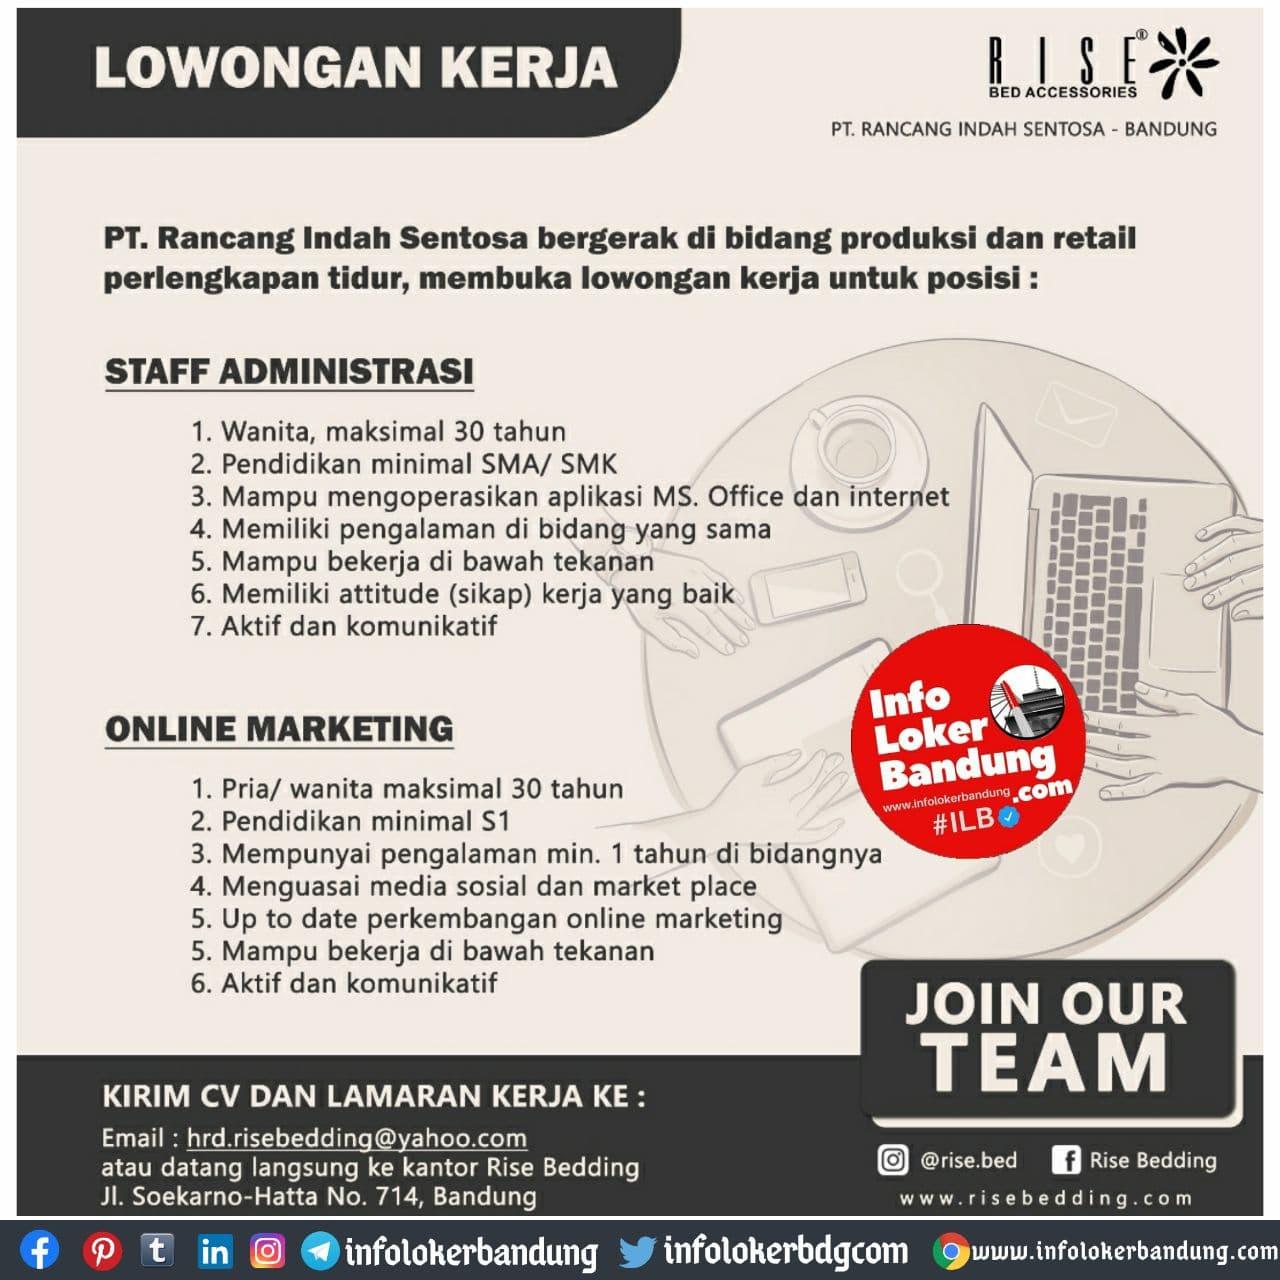 Lowongan Kerja PT. Rancang Indah Sentosa ( Rise Bed Accessories ) Bandung November 2020